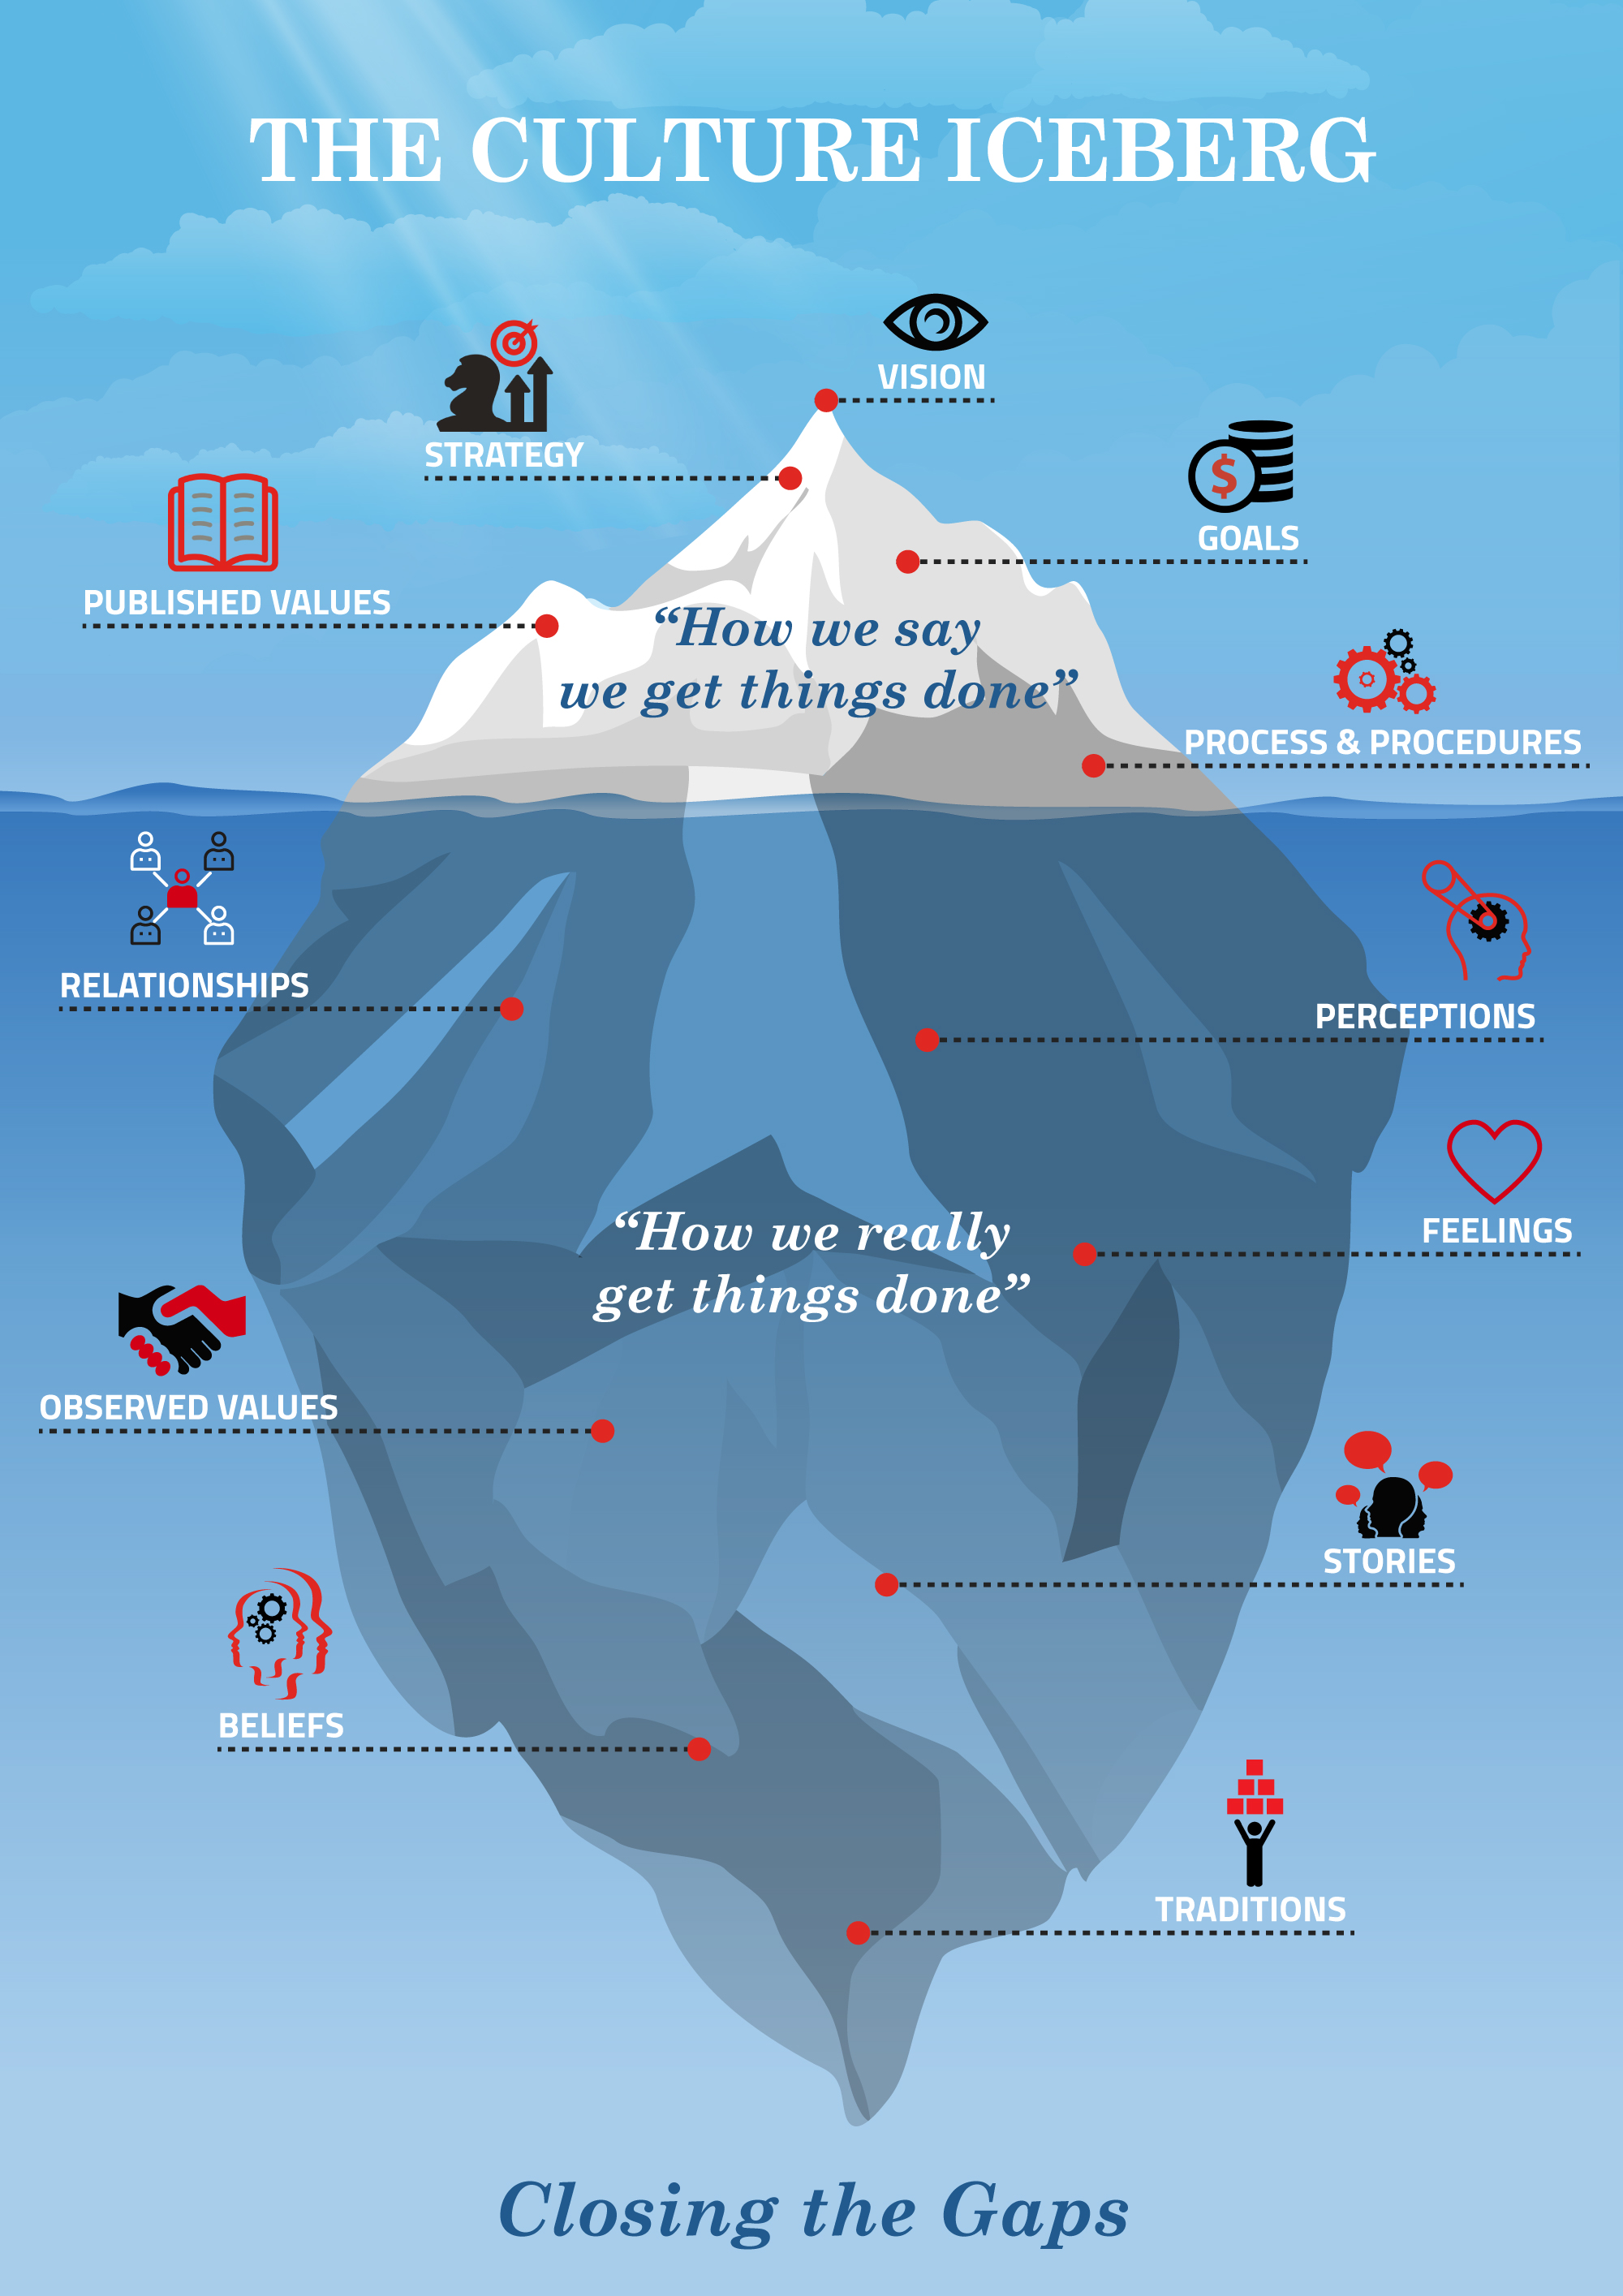 The Culture Iceberg